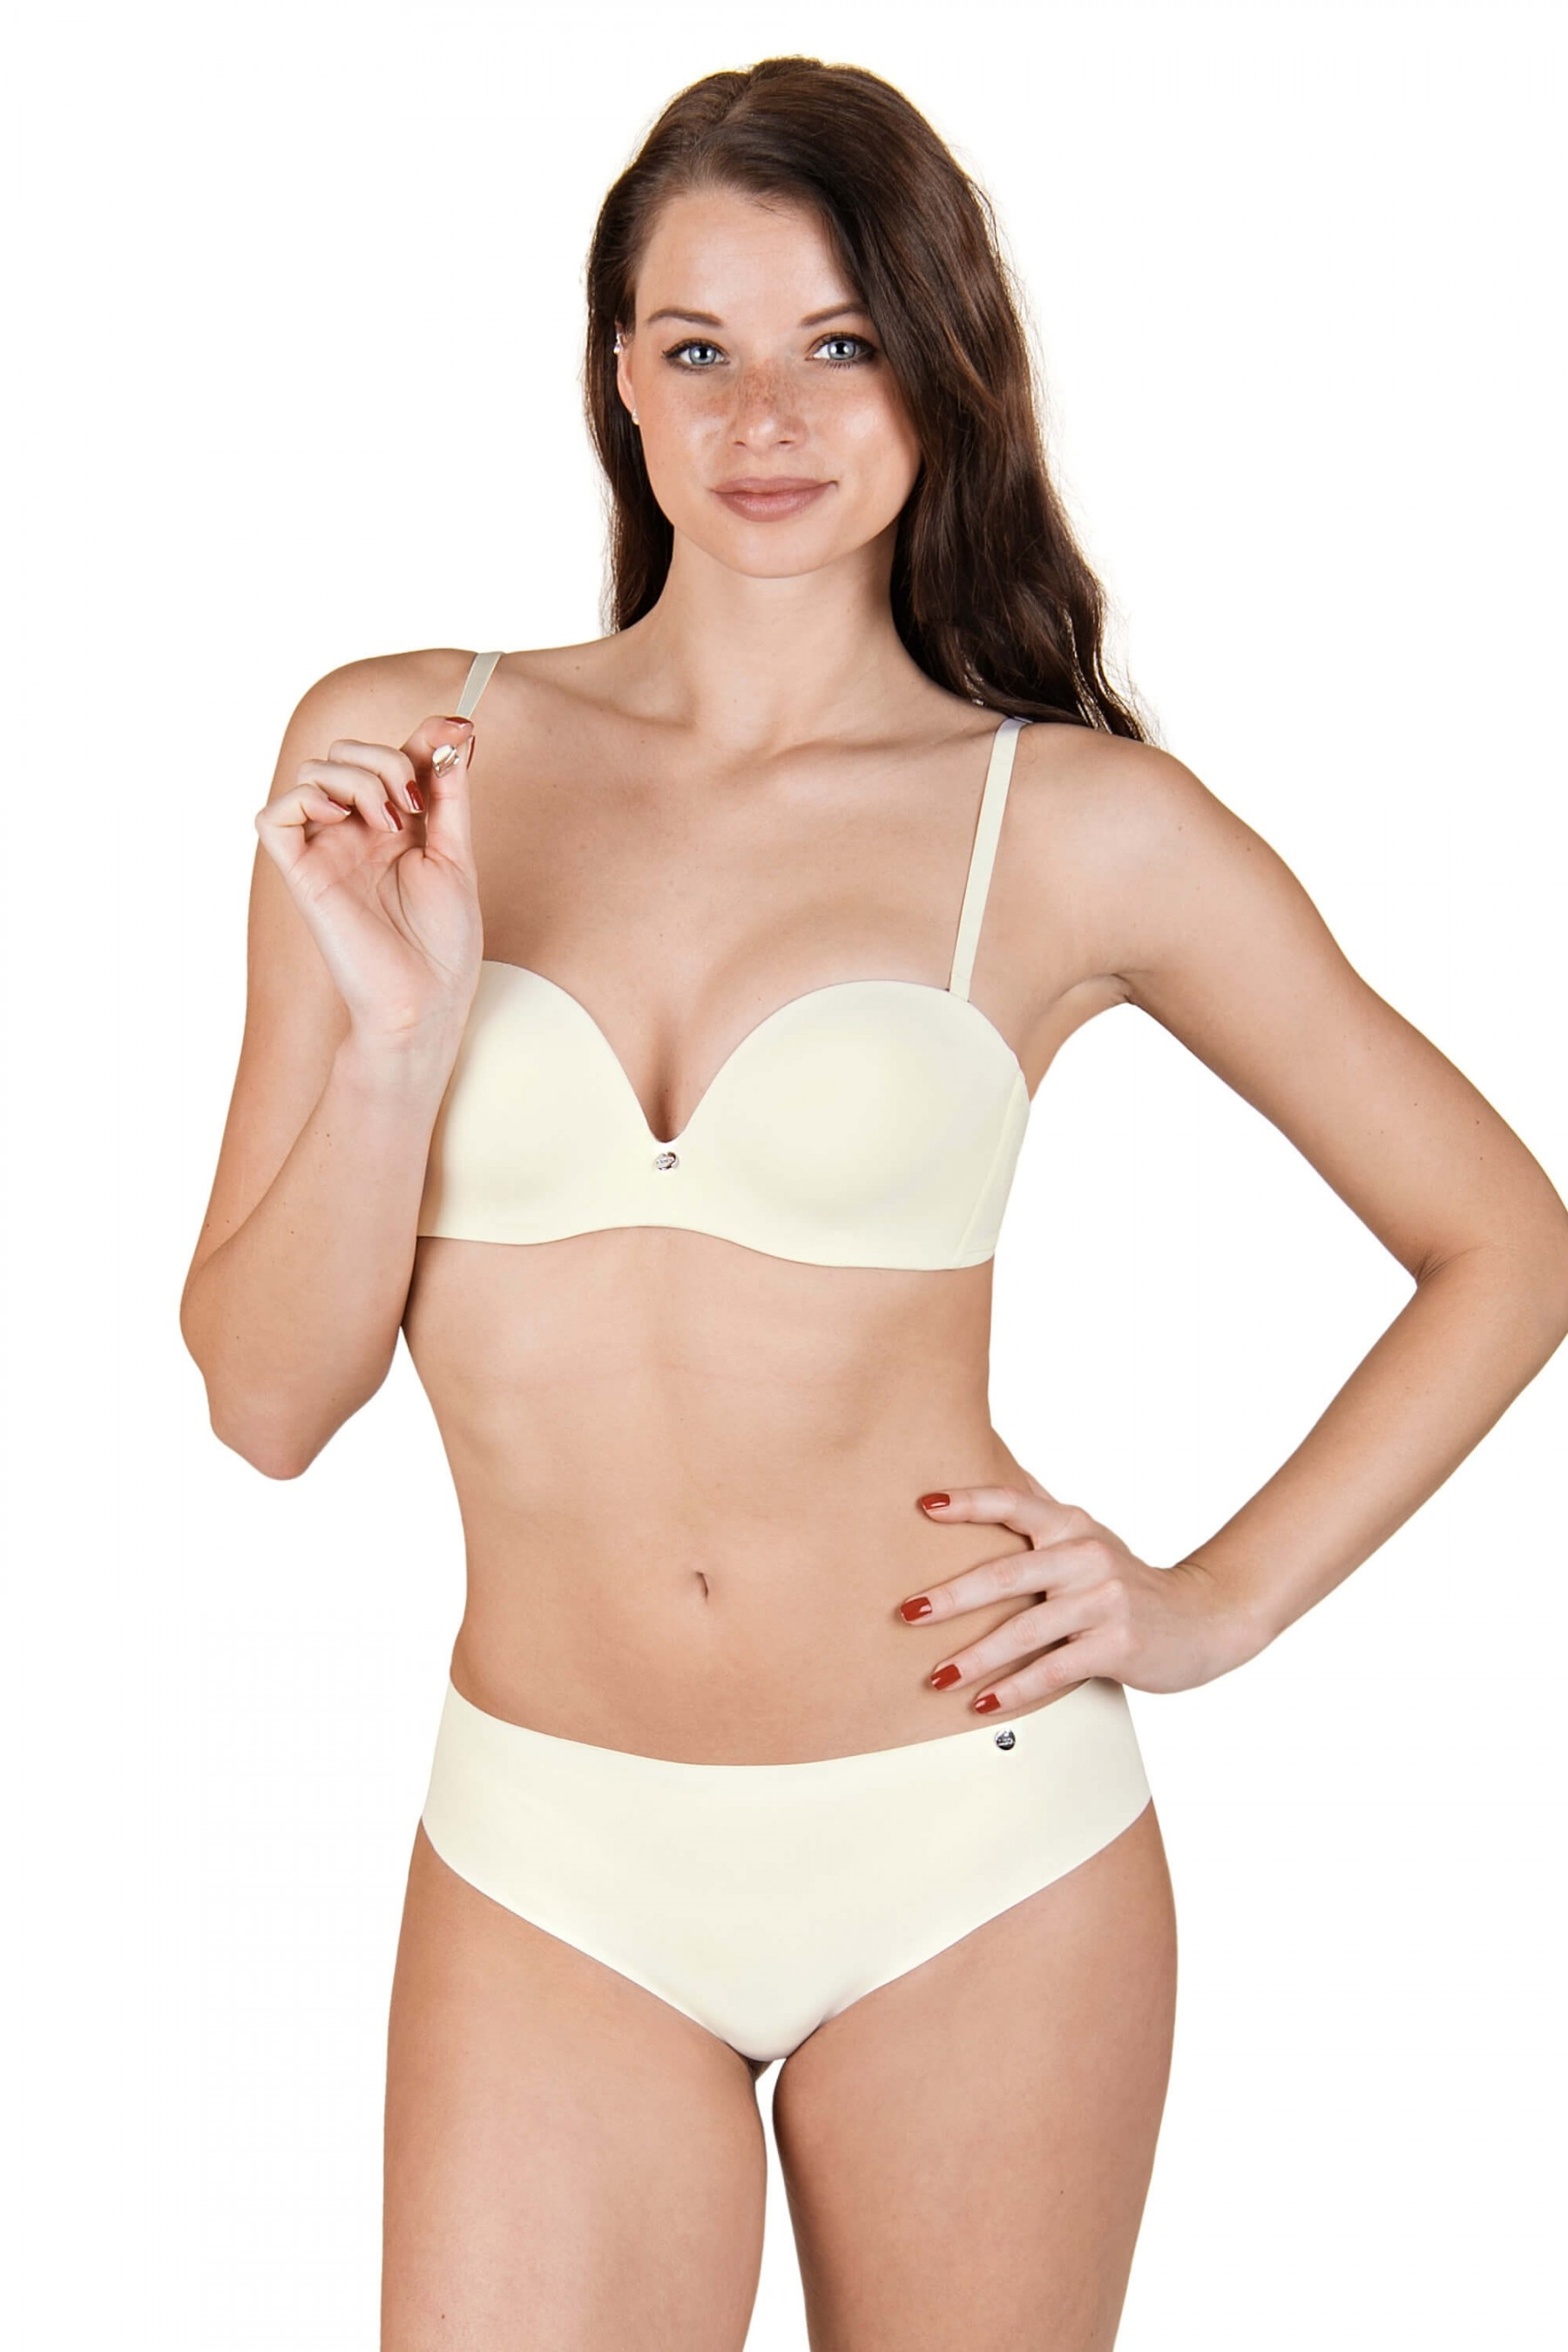 216d68b3fb Bella« Underwired Strapless Bra - WOMEN - LINGERIE - Lisca e-shop